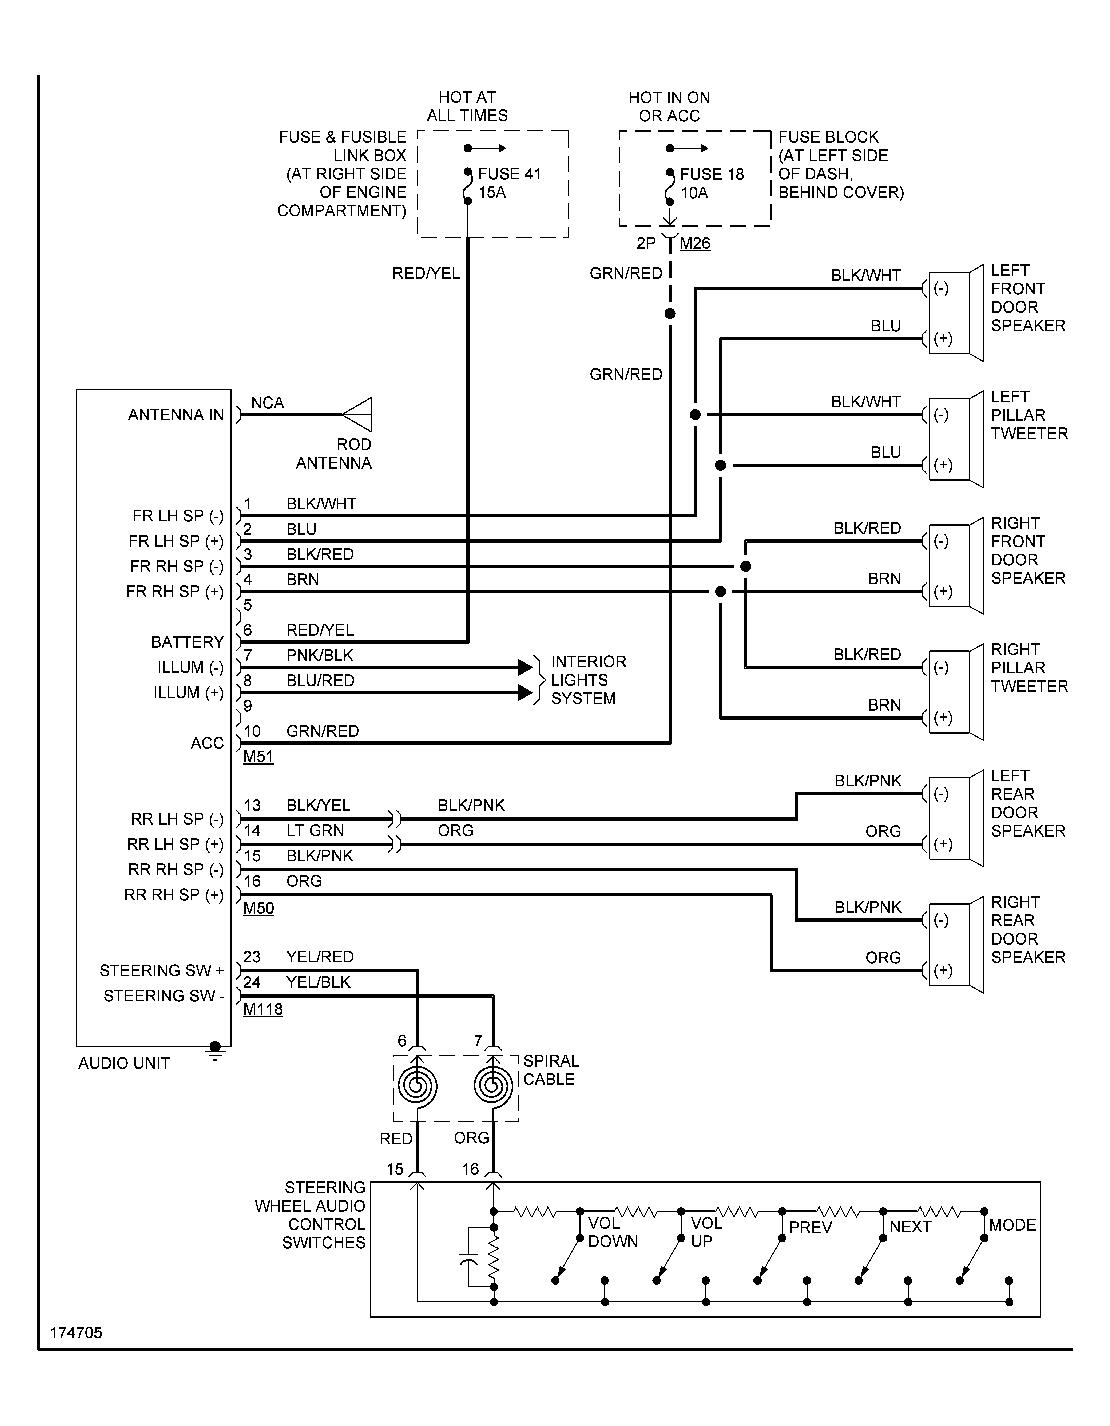 1997 nissan radio wiring harness wiring diagram expert 1997 nissan pathfinder stereo wiring diagram 1997 nissan radio wiring harness